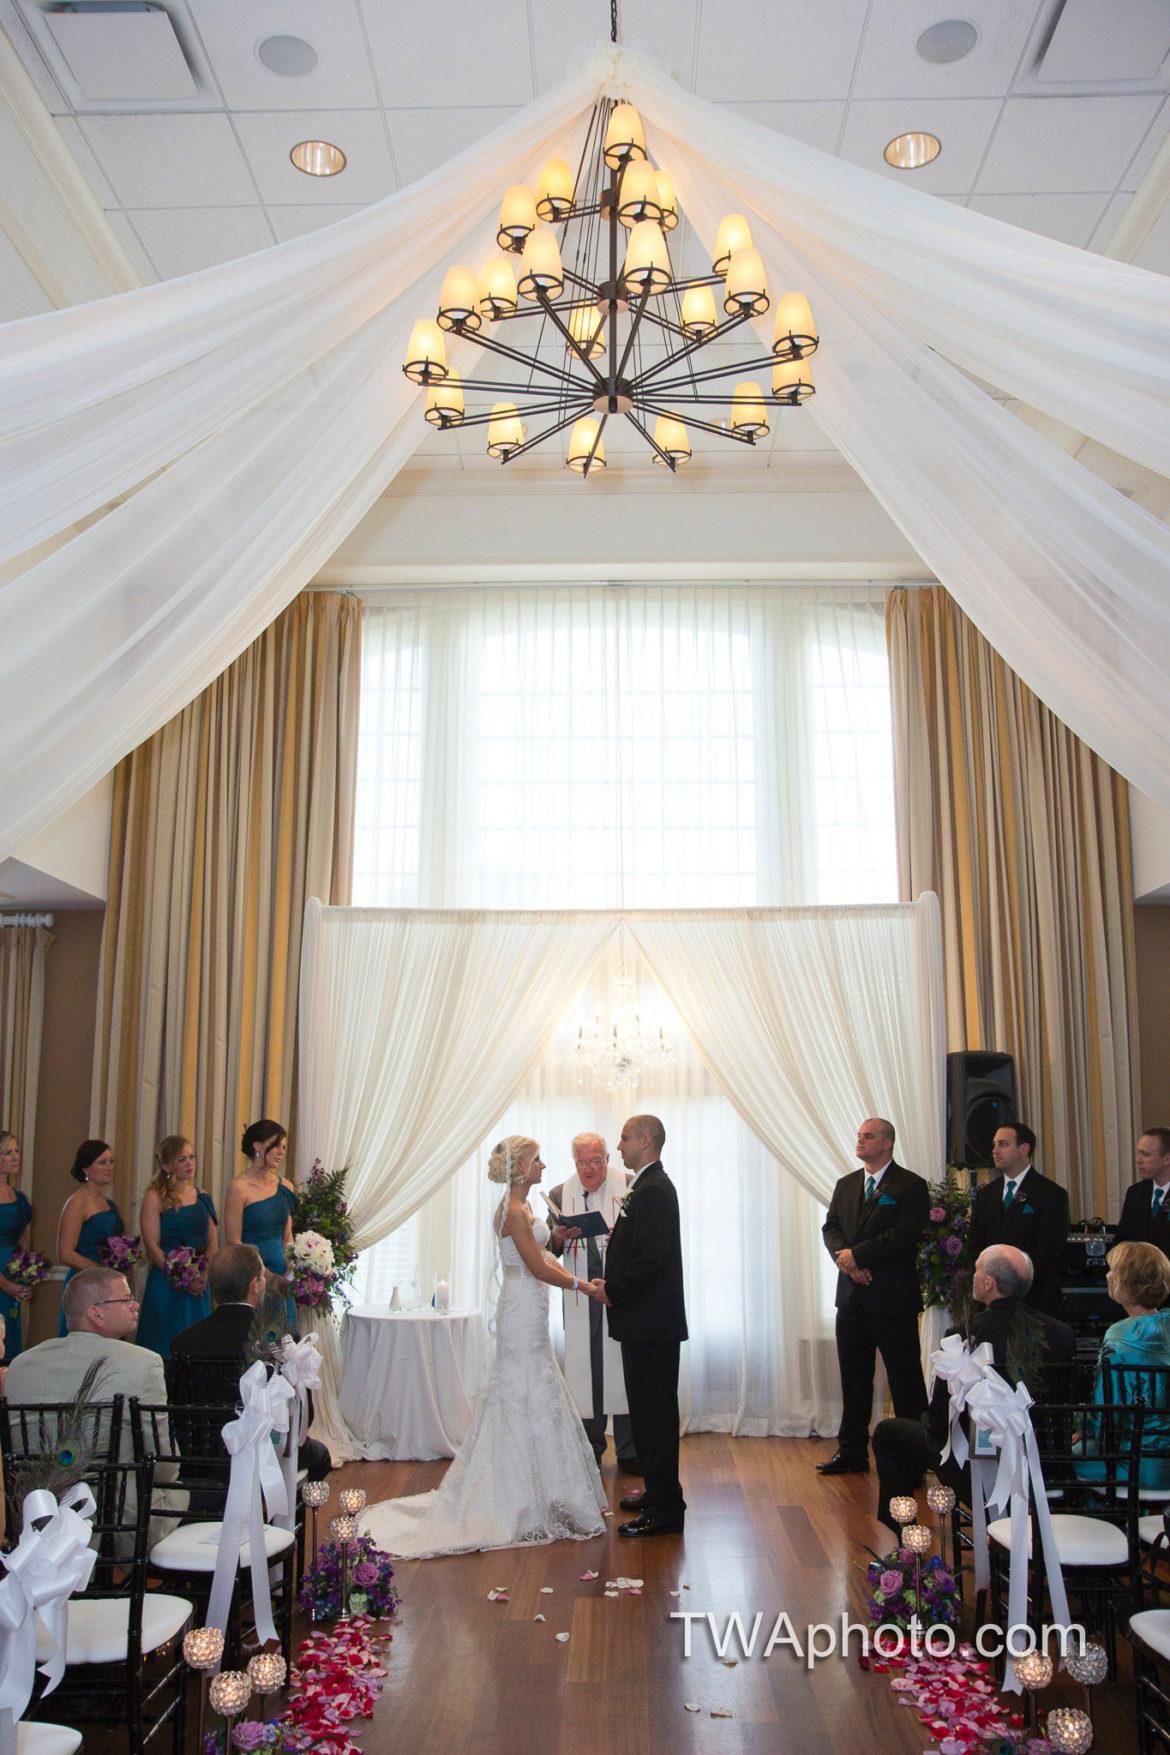 Elegant_Event_Lighting_Chicago_Arrowhead_Golf_Club_Wheaton_Wedding_Ceiling_Drapes_Ivory_Bridal_Arch_Ceremony_Crystal_Chandelier